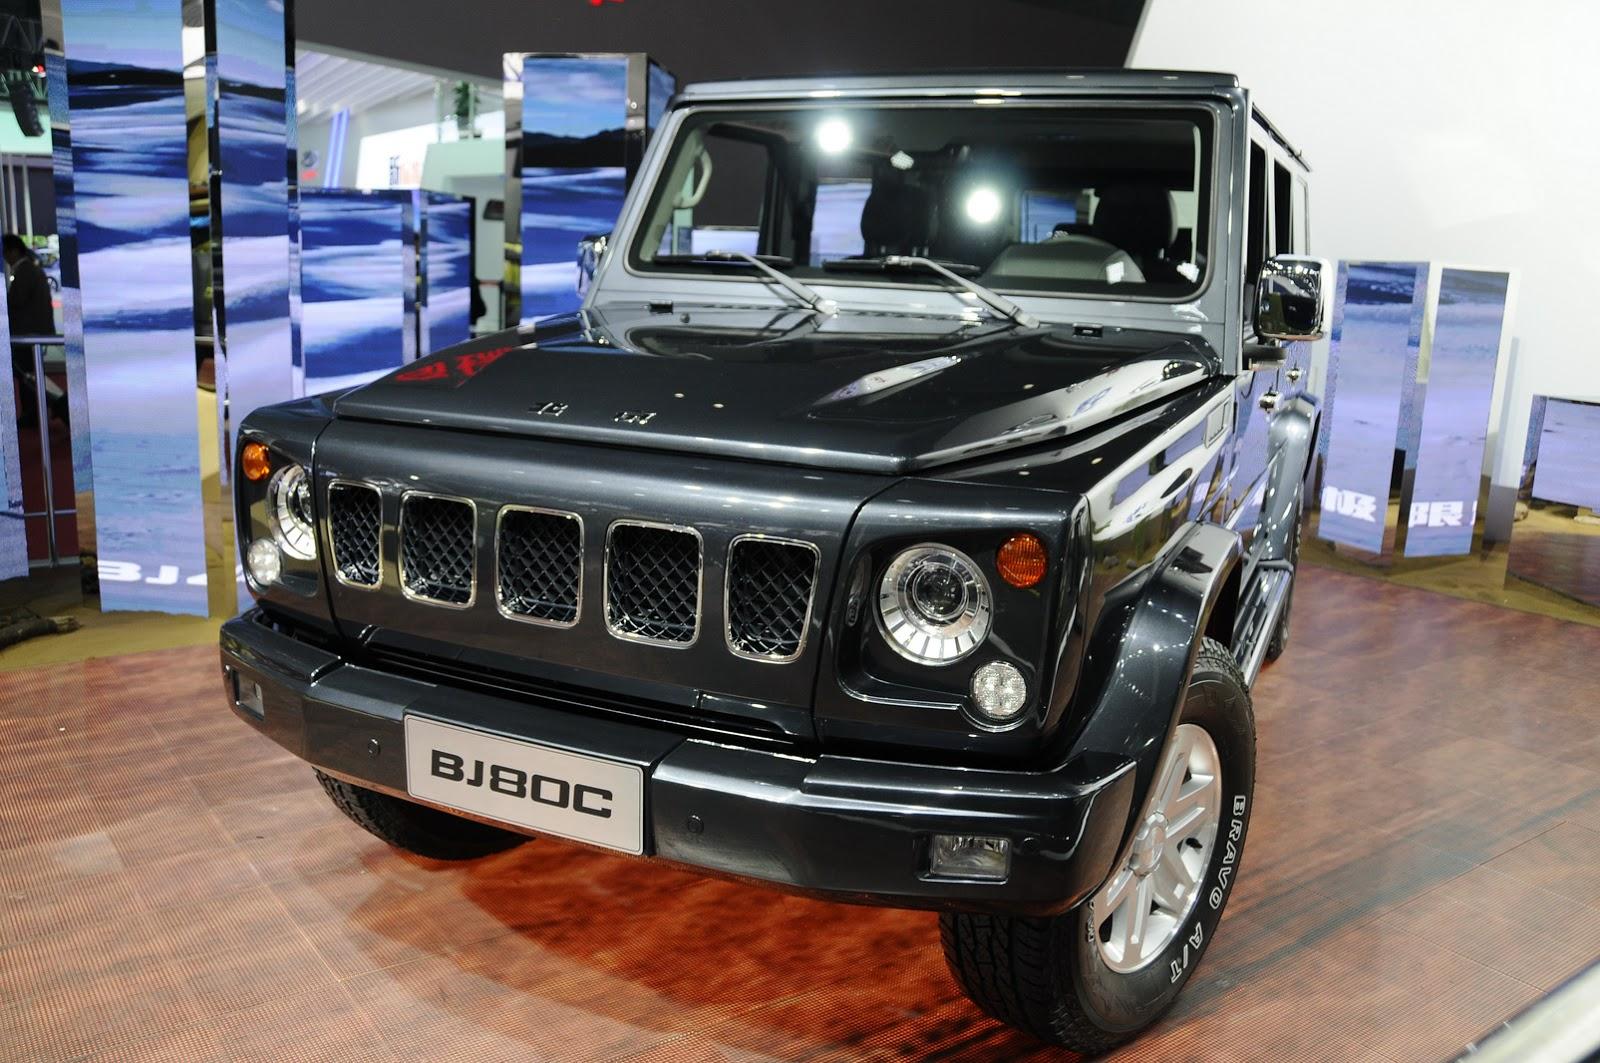 2015 - [Chine] Salon Auto de Shanghai - Page 2 BAIC-BJ80C-6